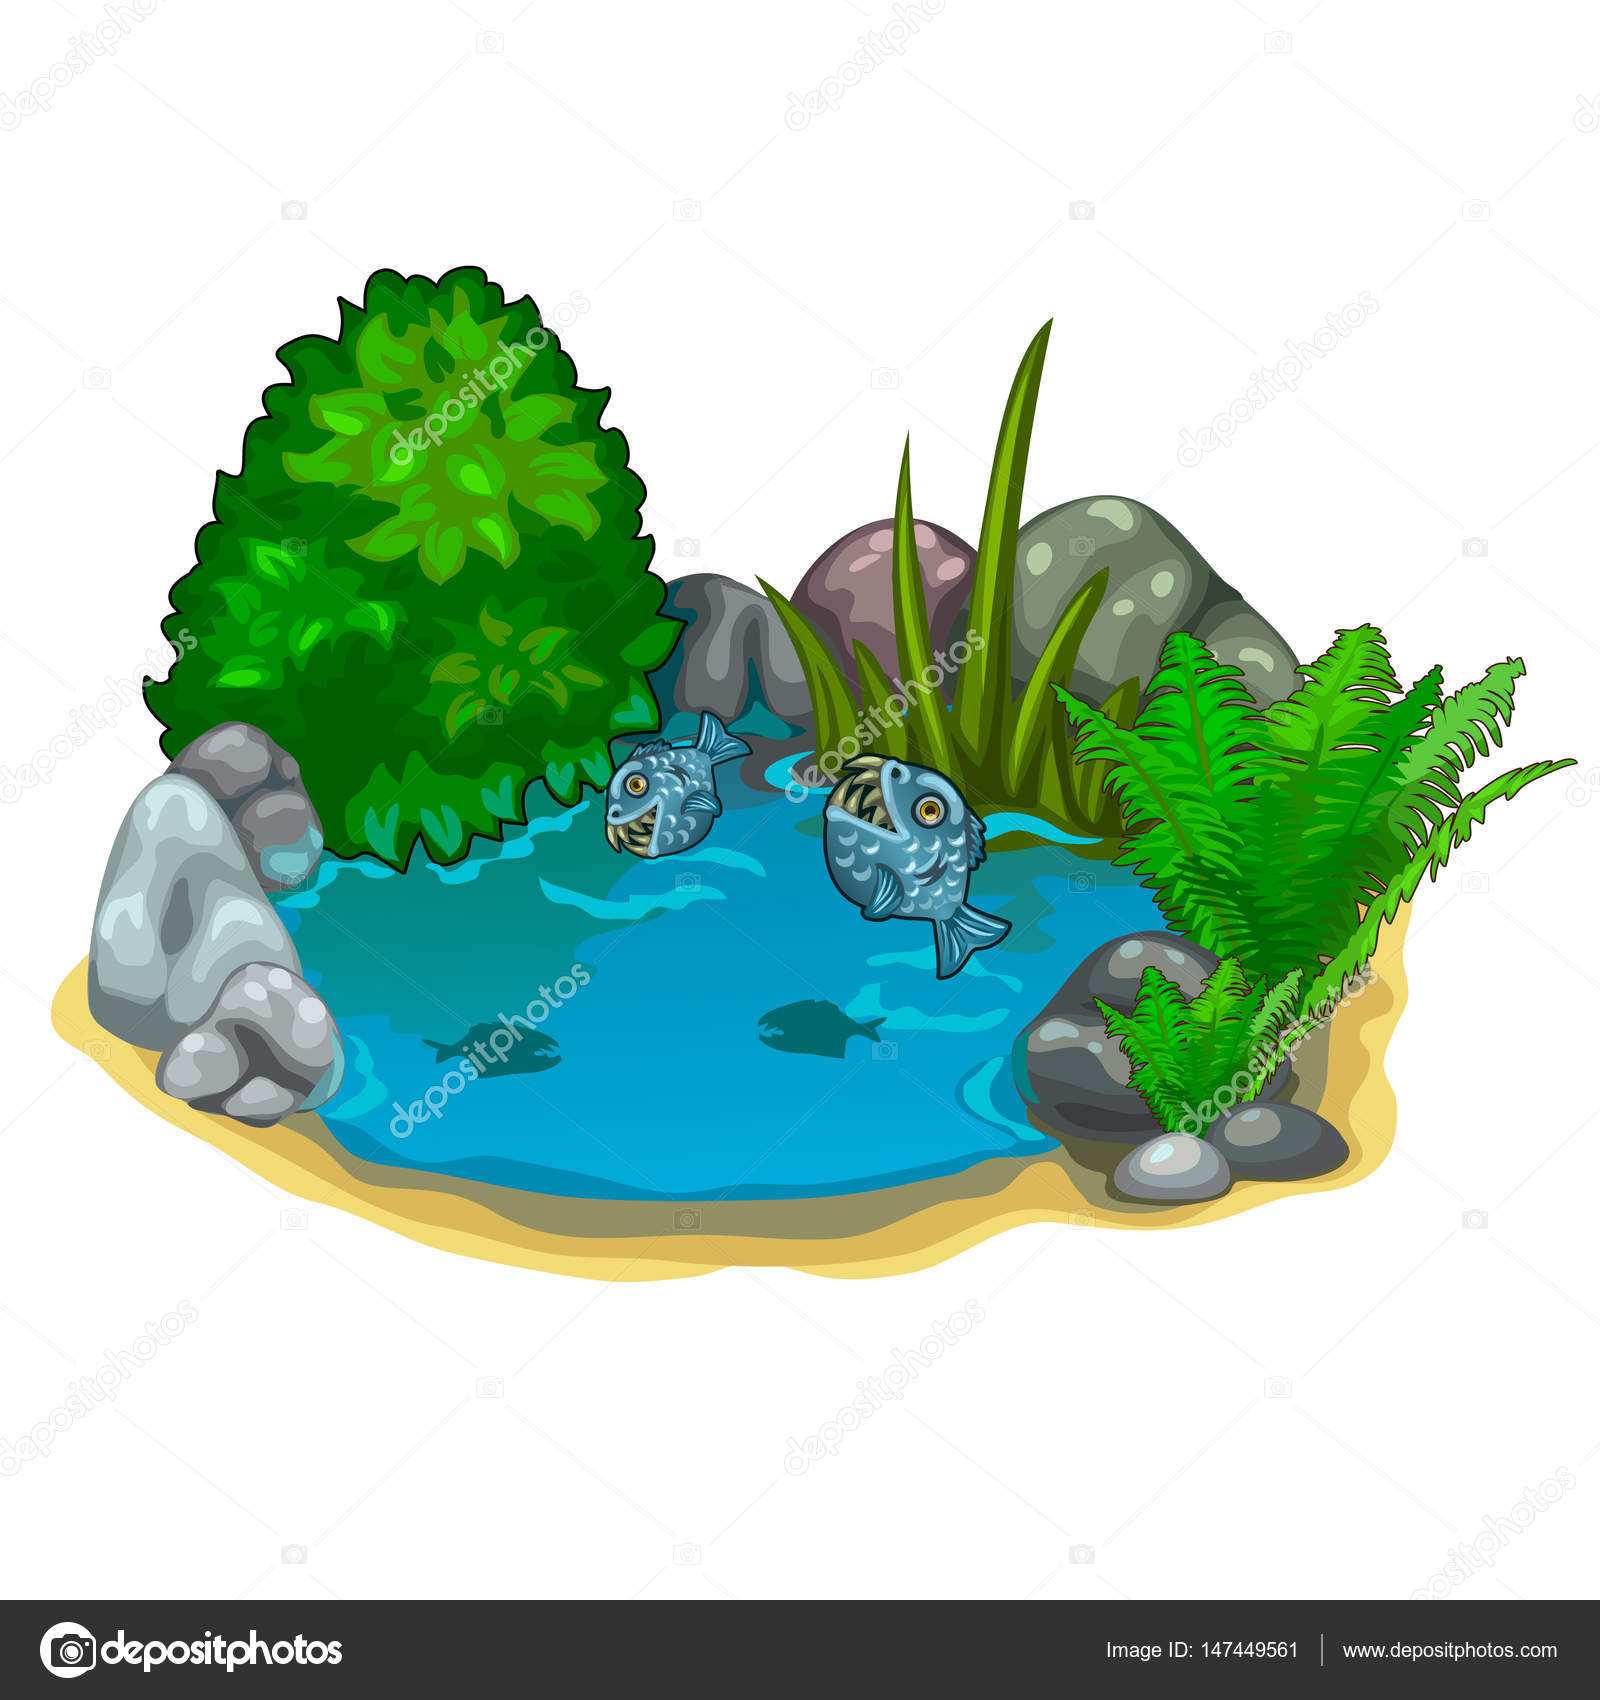 Rybn k s drav piran rostlinami a kameny stock vektor for Impermeabilizacion de estanques para peces